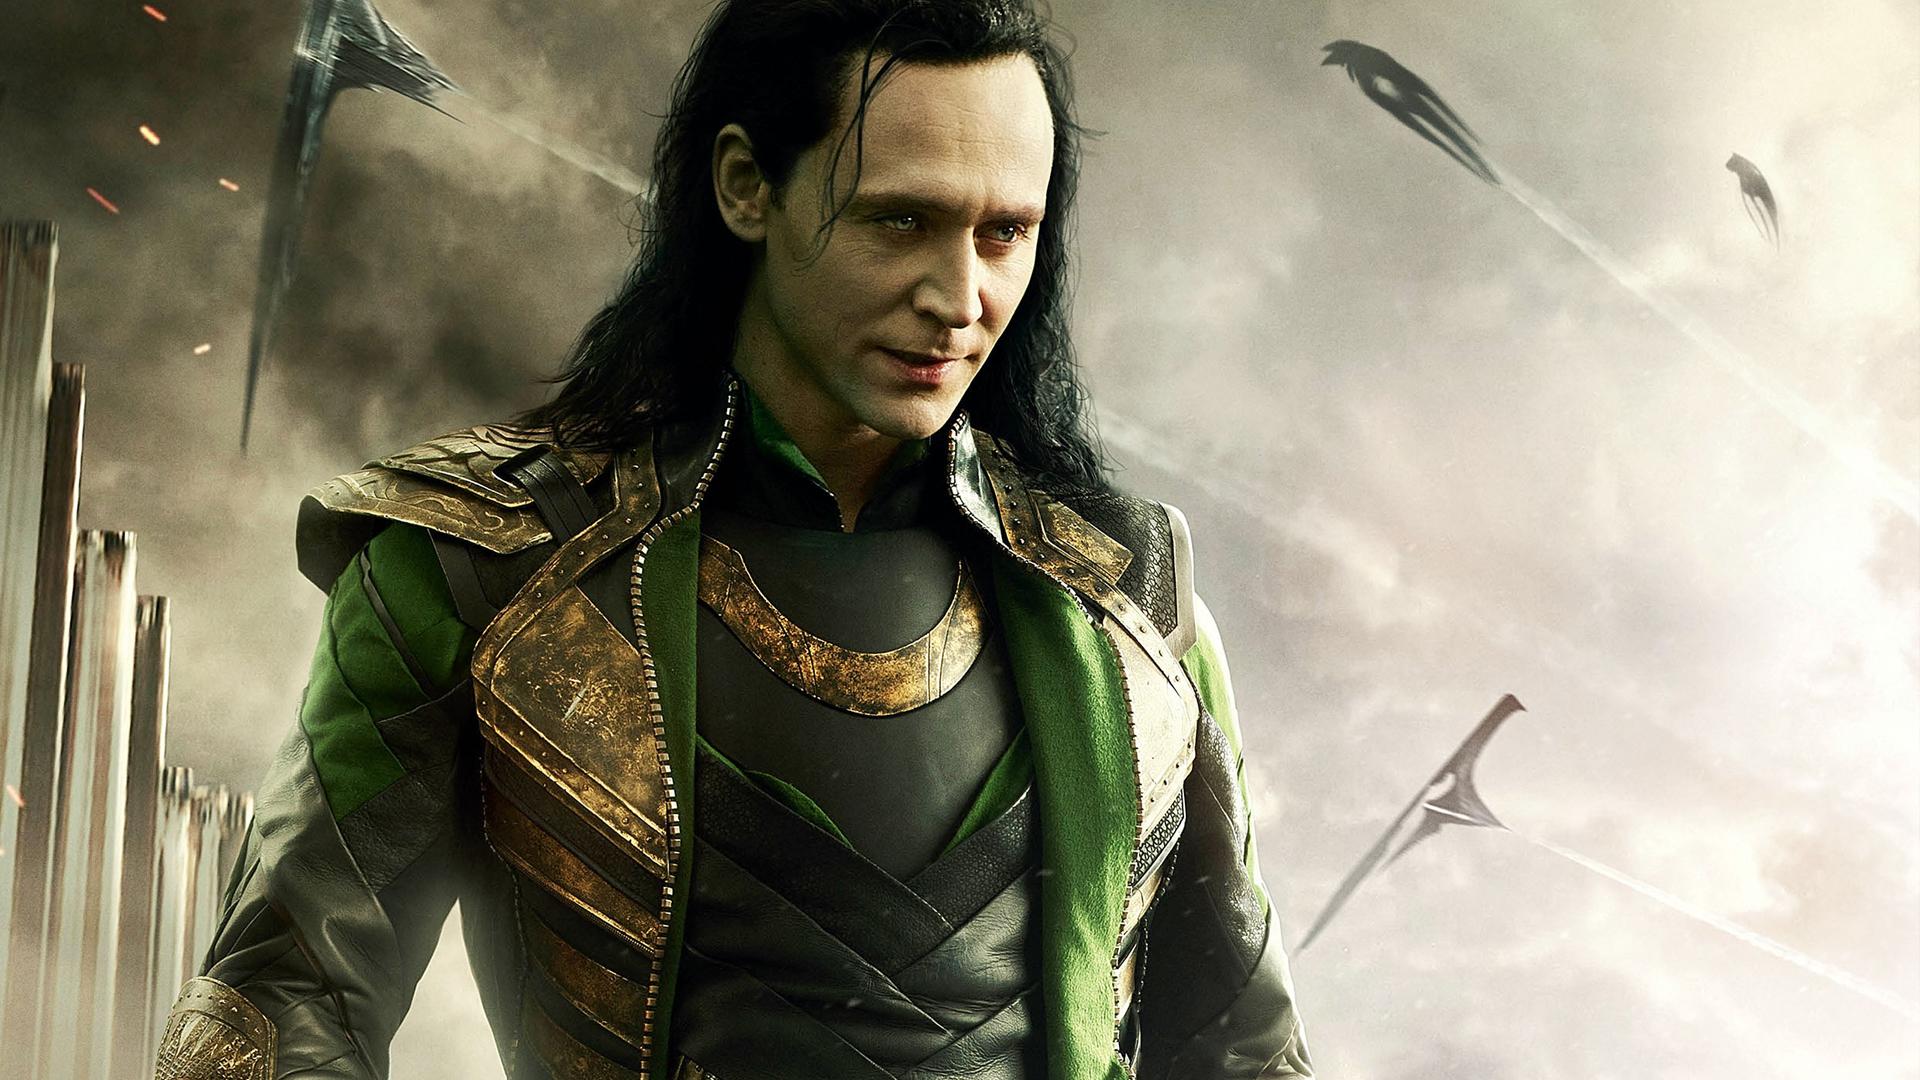 loki-tom-hiddleston-avengers-age-of-ultron